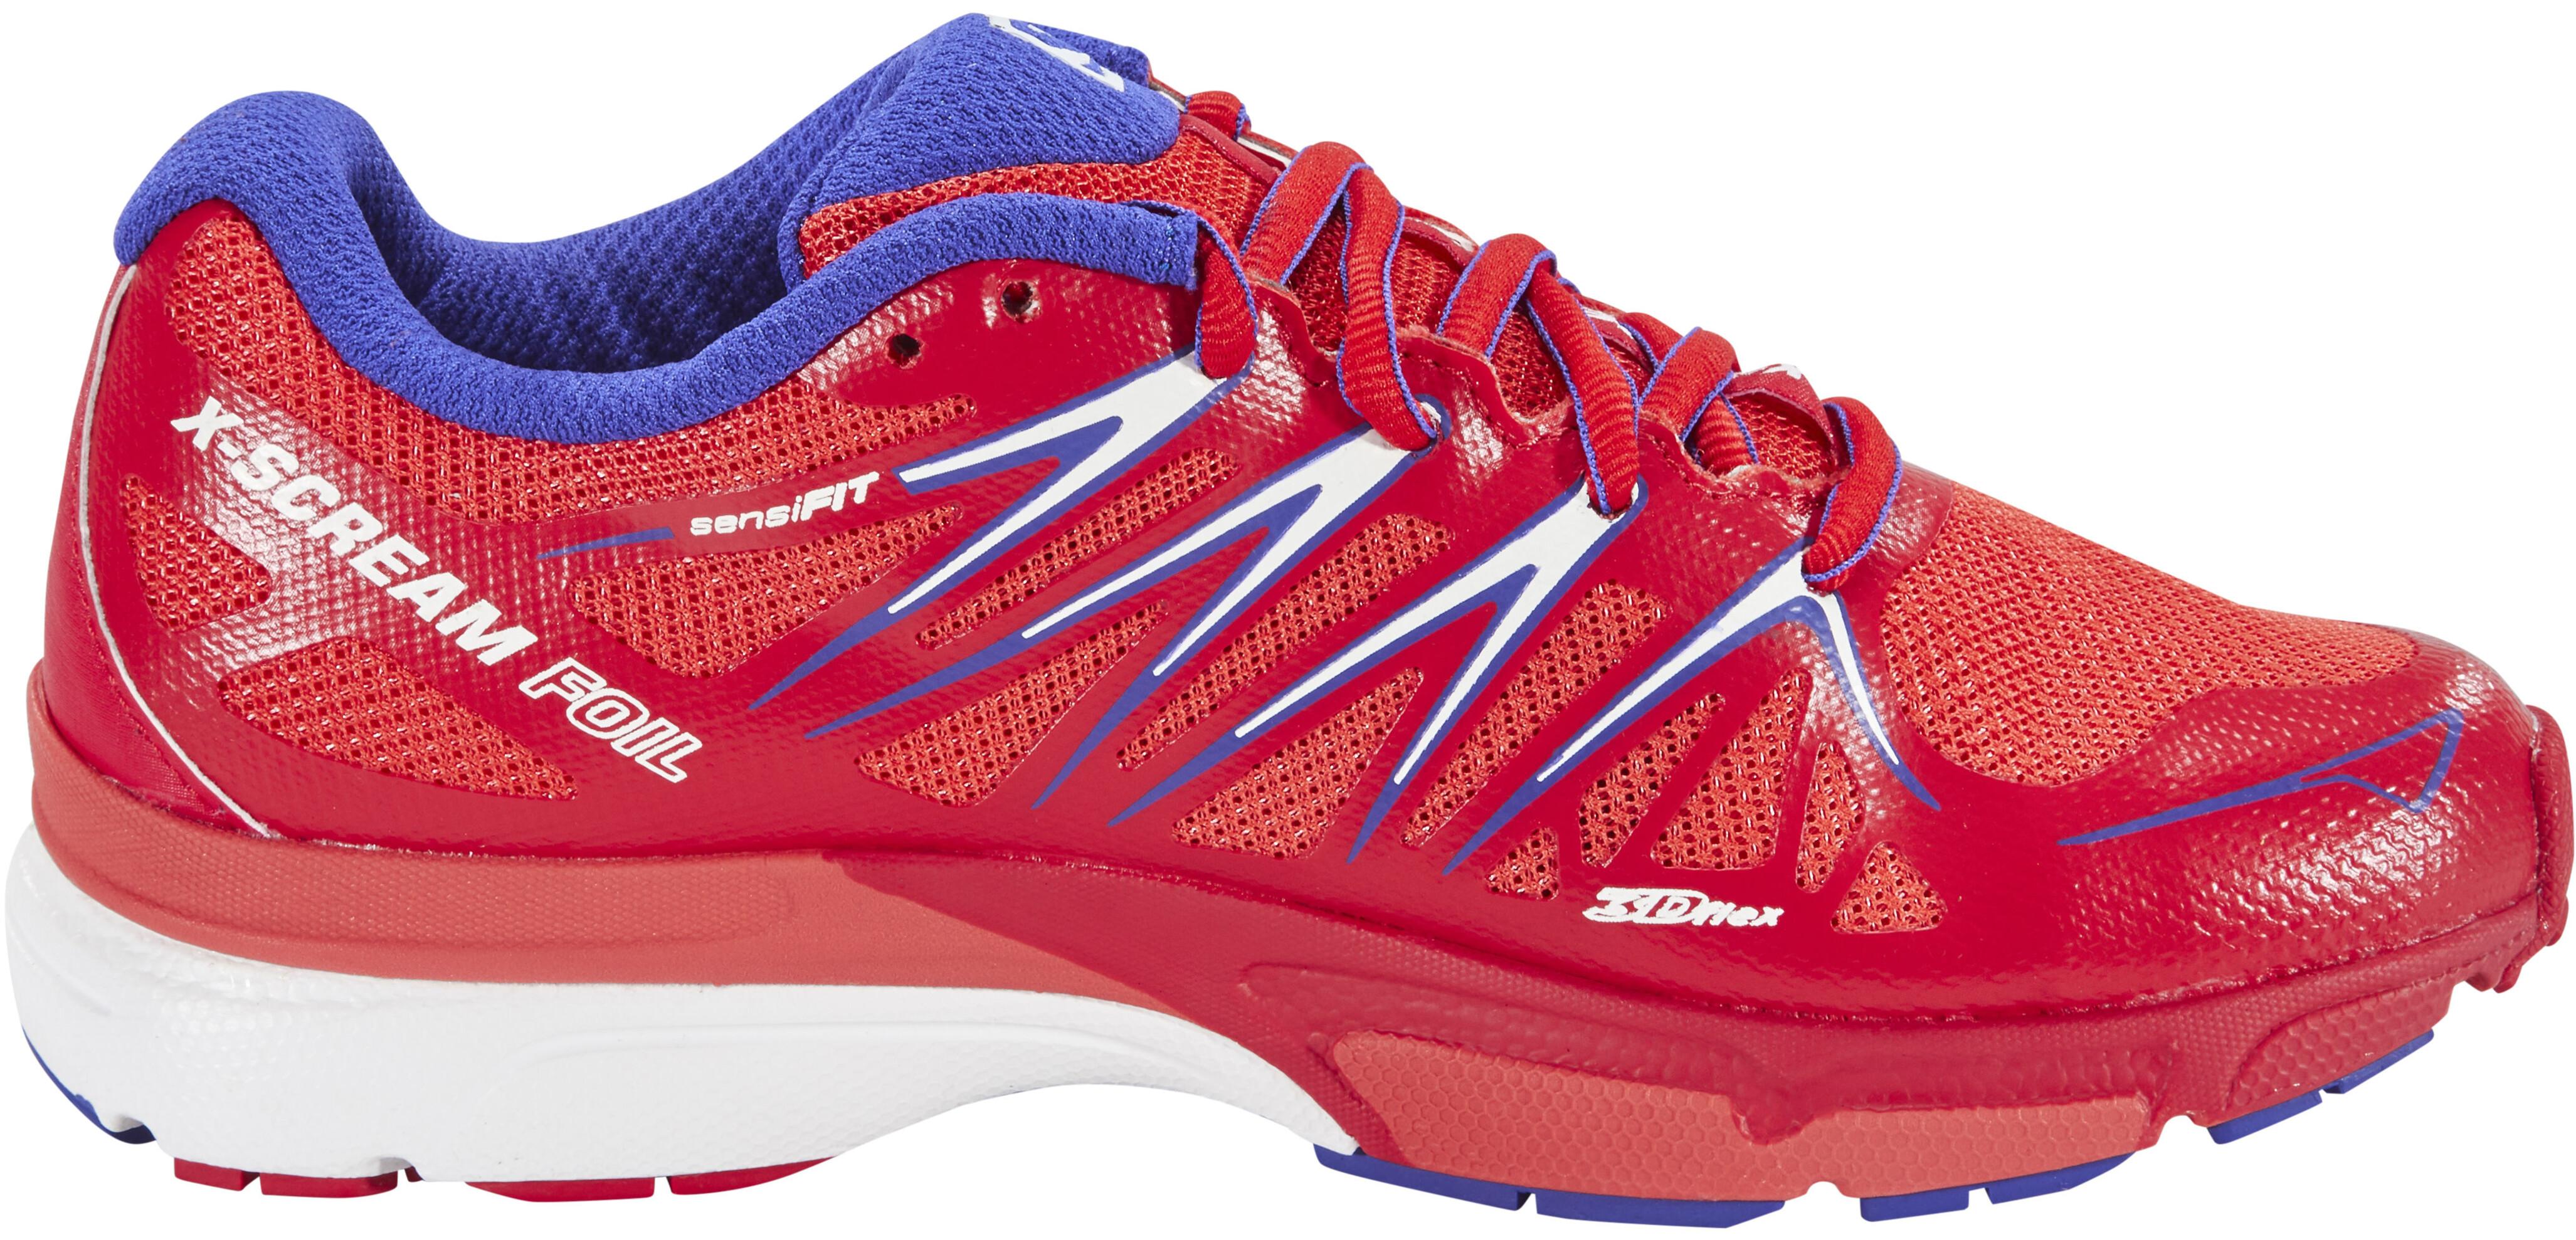 Salomon X-Scream Foil - Zapatillas running Mujer - rojo  d560343b42